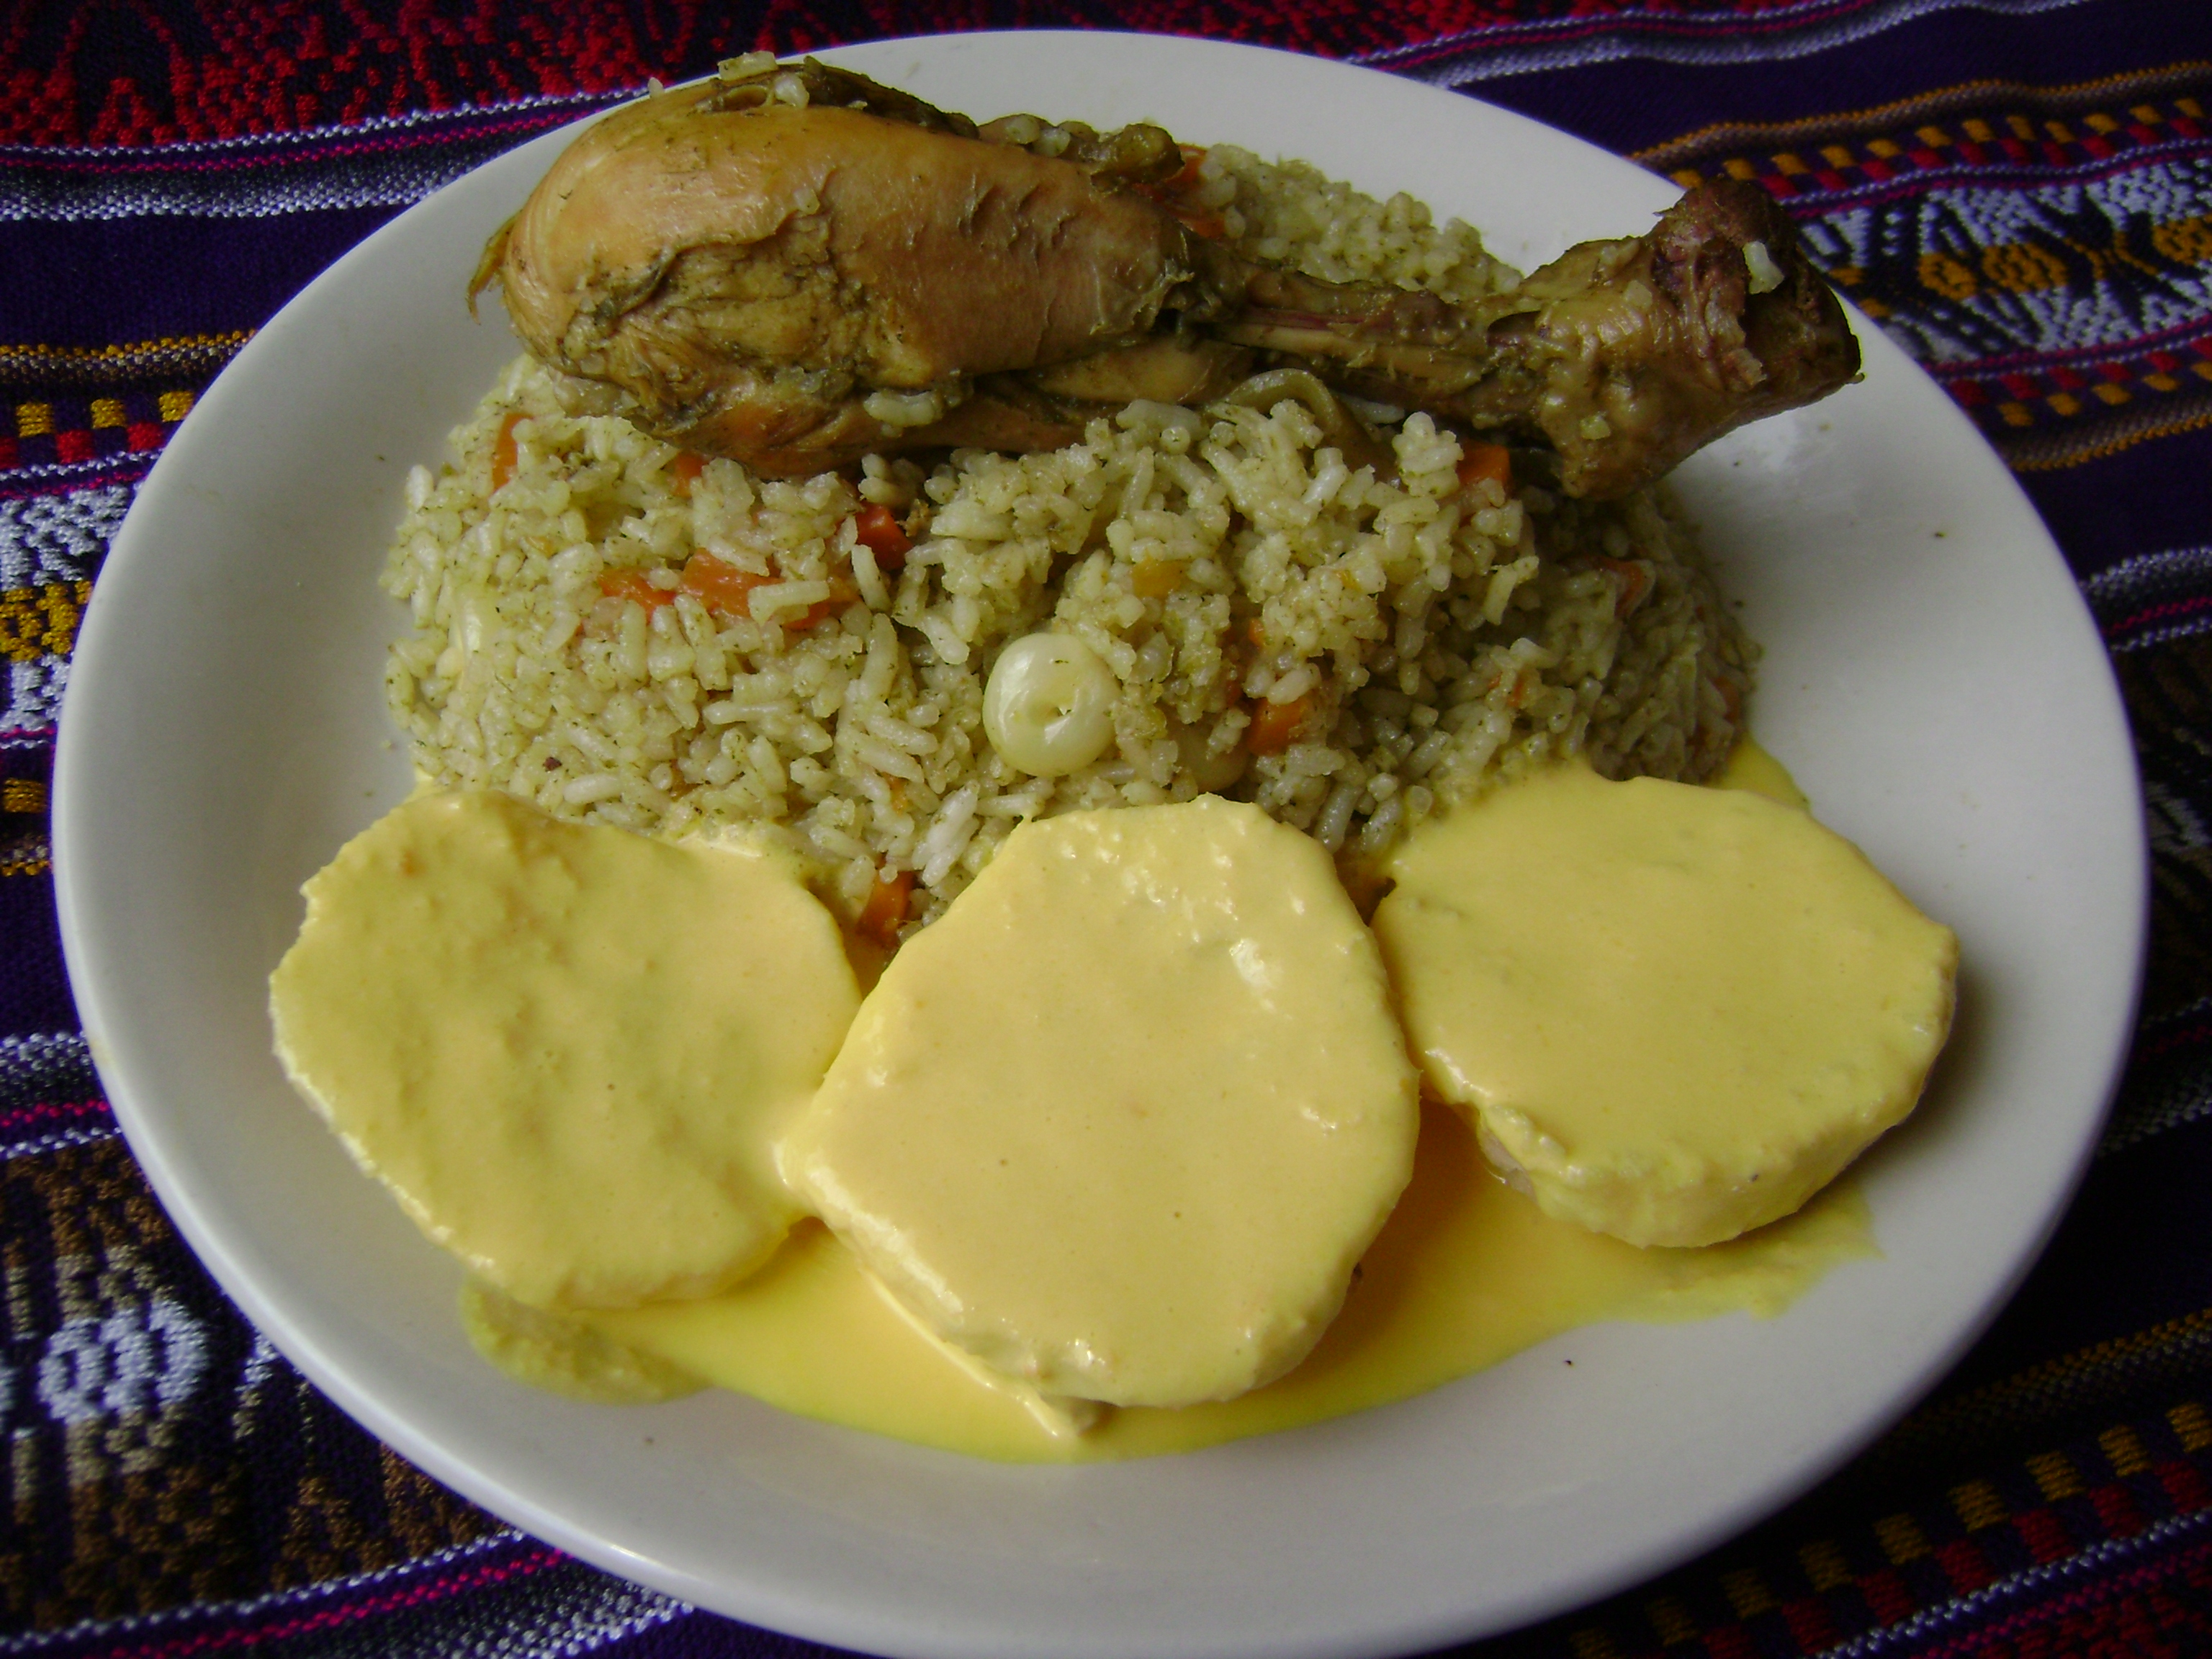 File:Arroz con pollo y papa a la huancaina.JPG - Wikipedia